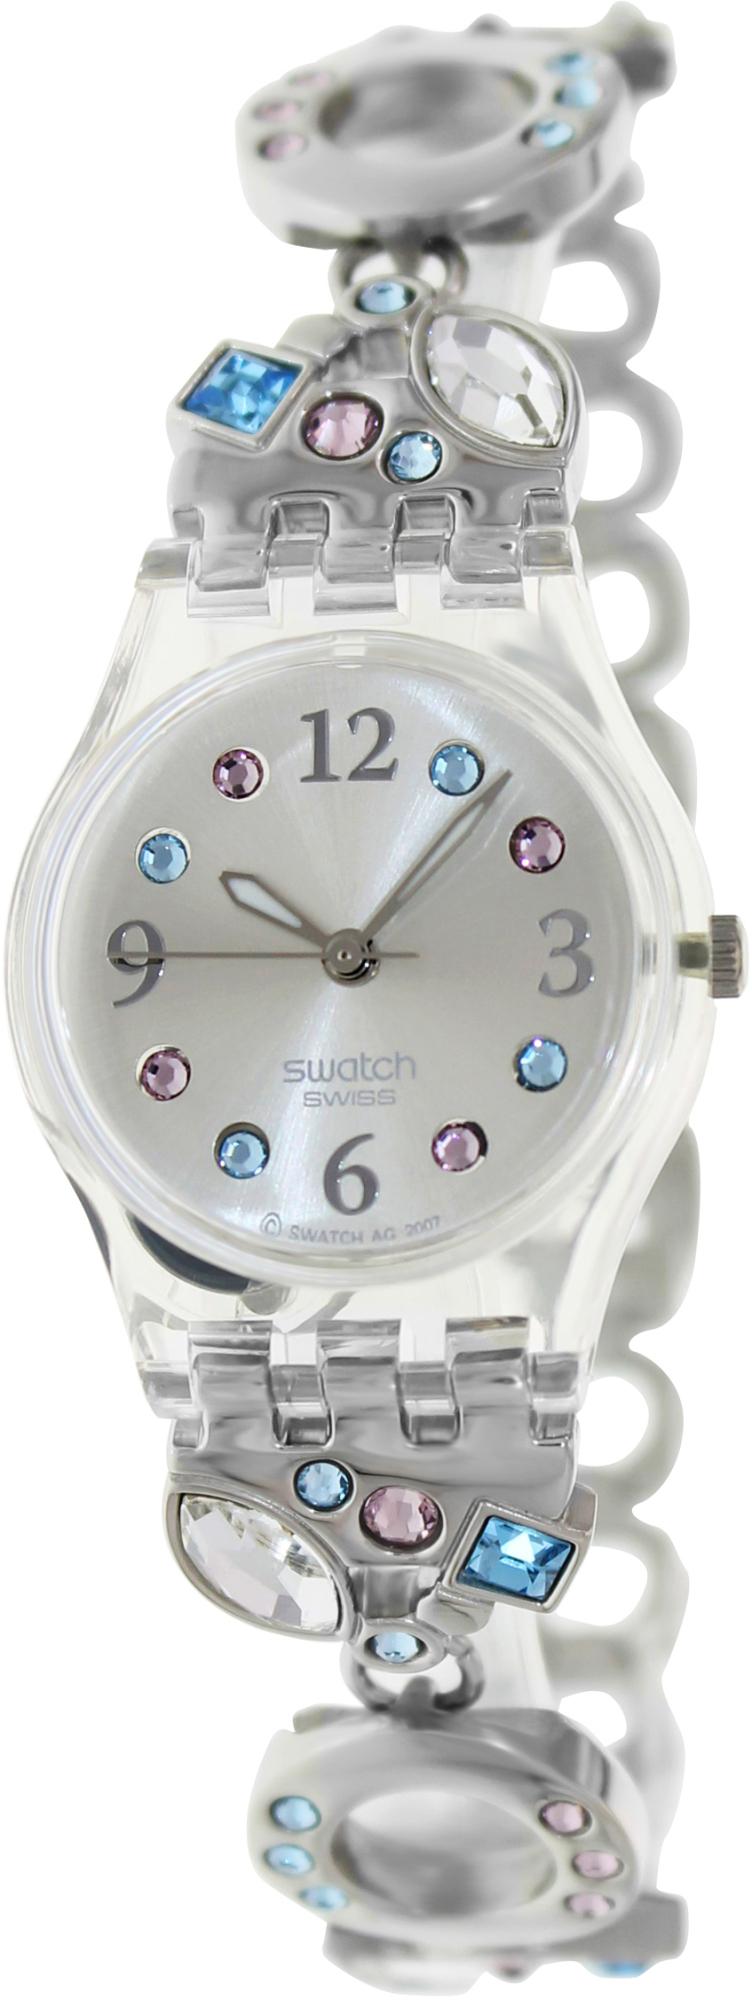 Swatch_Womens_Originals_LK292G_Silver_StainlessSteel_Swiss_Quartz_Dress_Watch